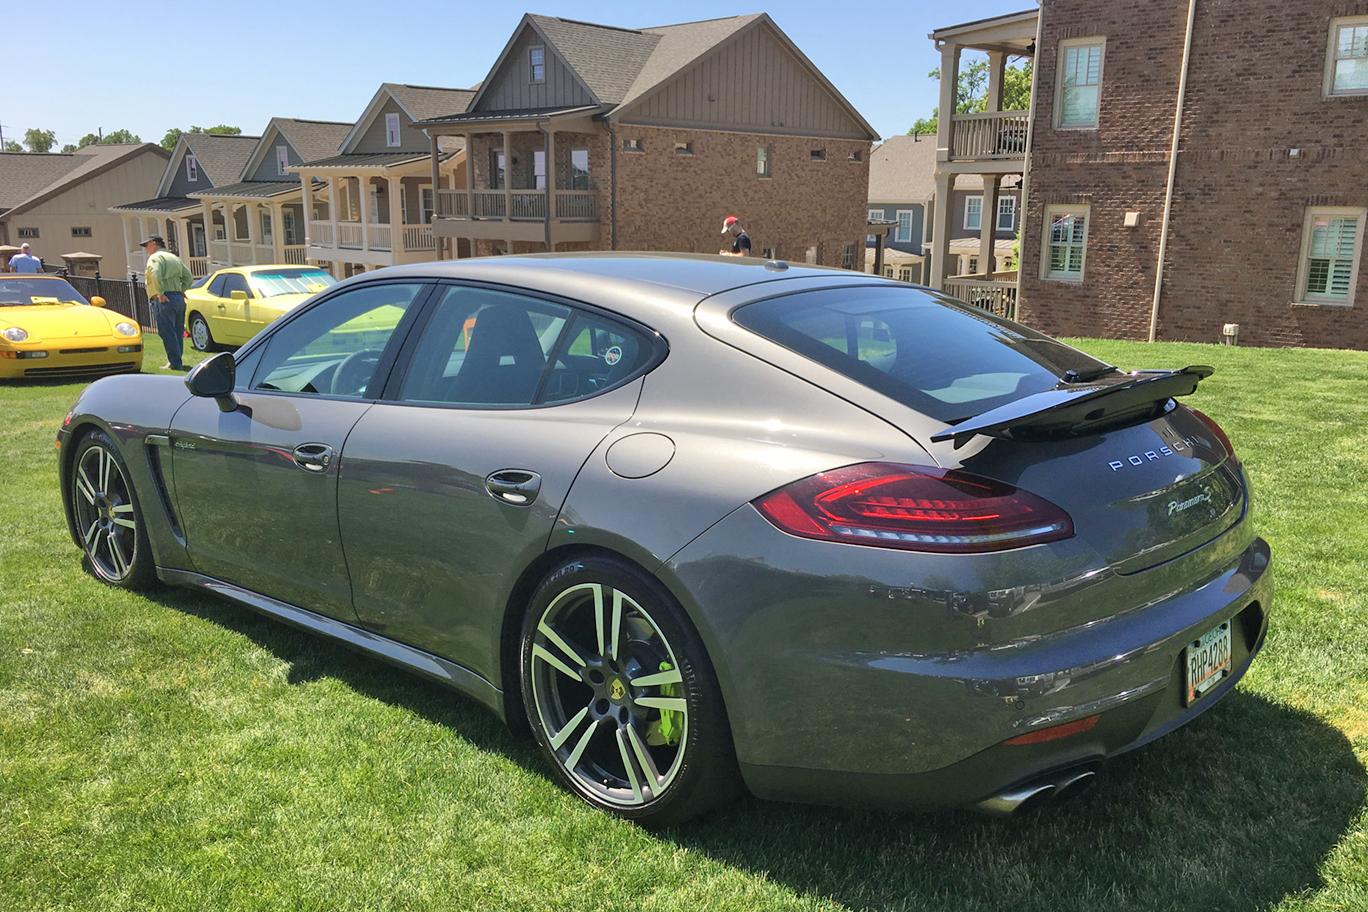 Diyer Modifies Hybrid Porsche Panamera Turbo Spoiler Adaptive Cruise Control 911 Steering Wheel Porsche Club Of America